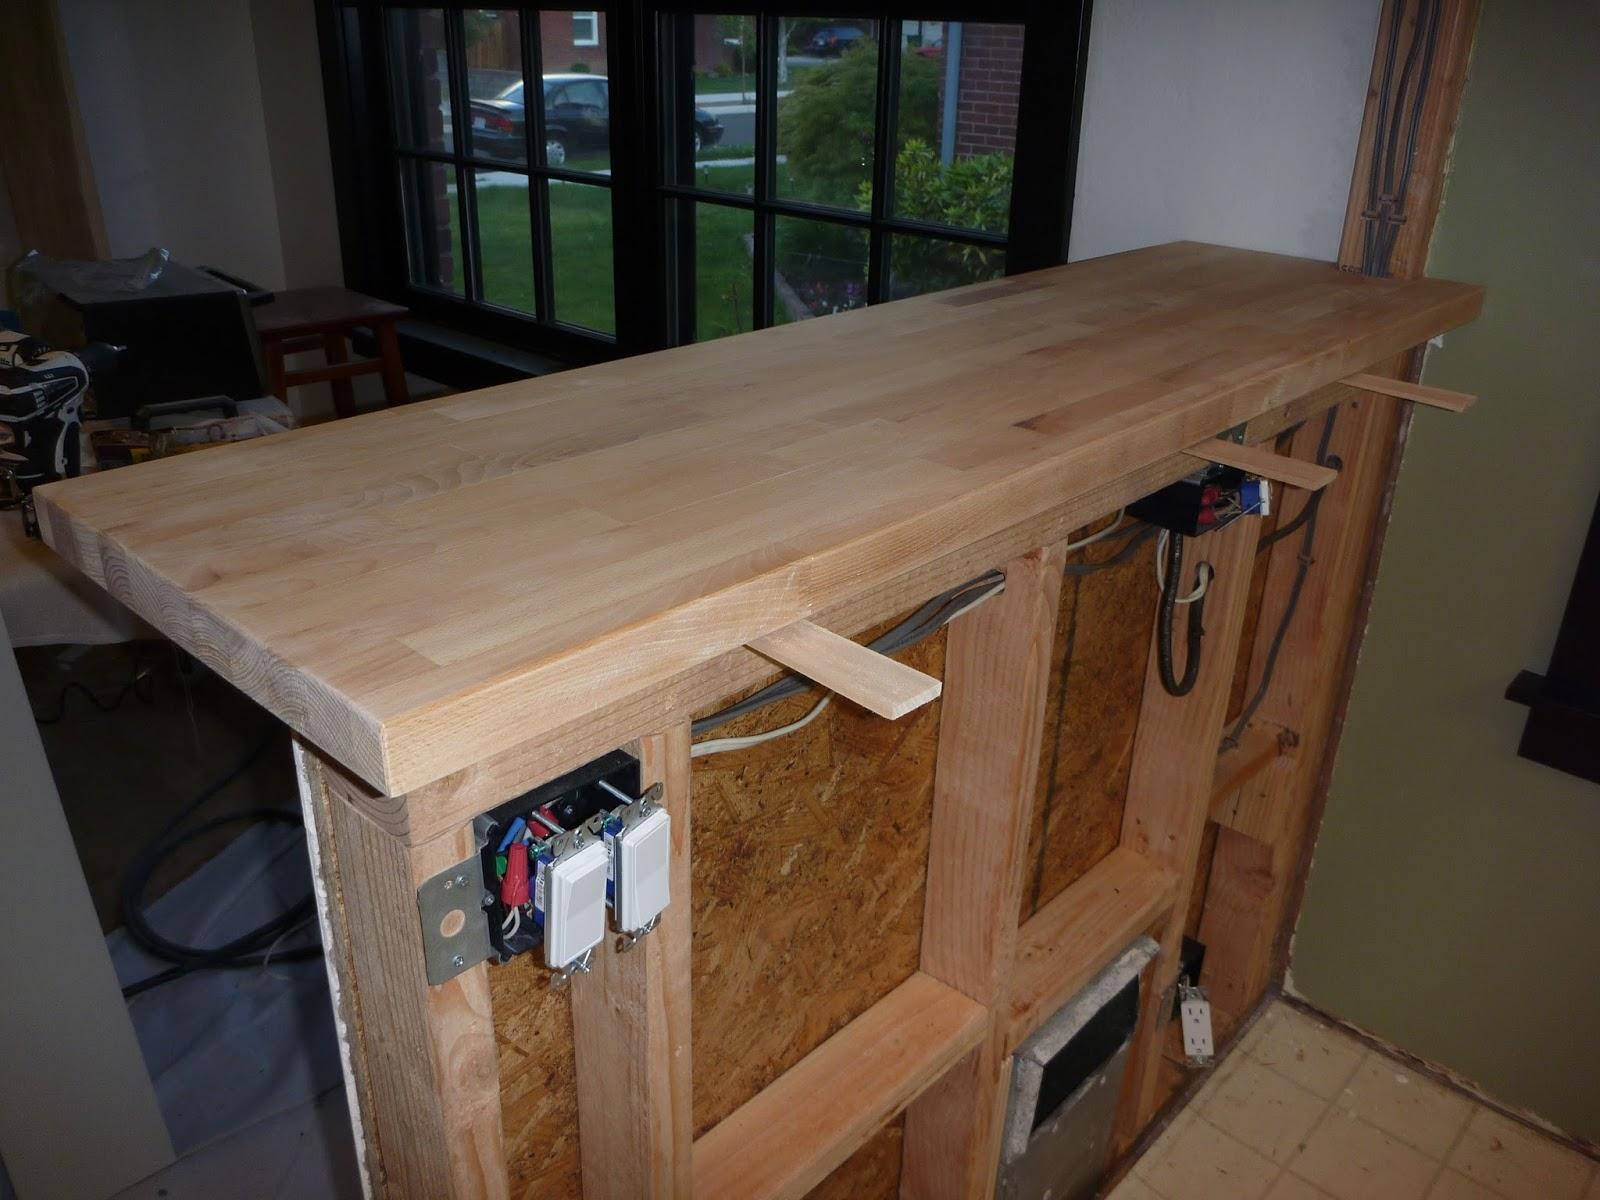 My Stupid House: Building A Sturdy Half Wall Bar Top